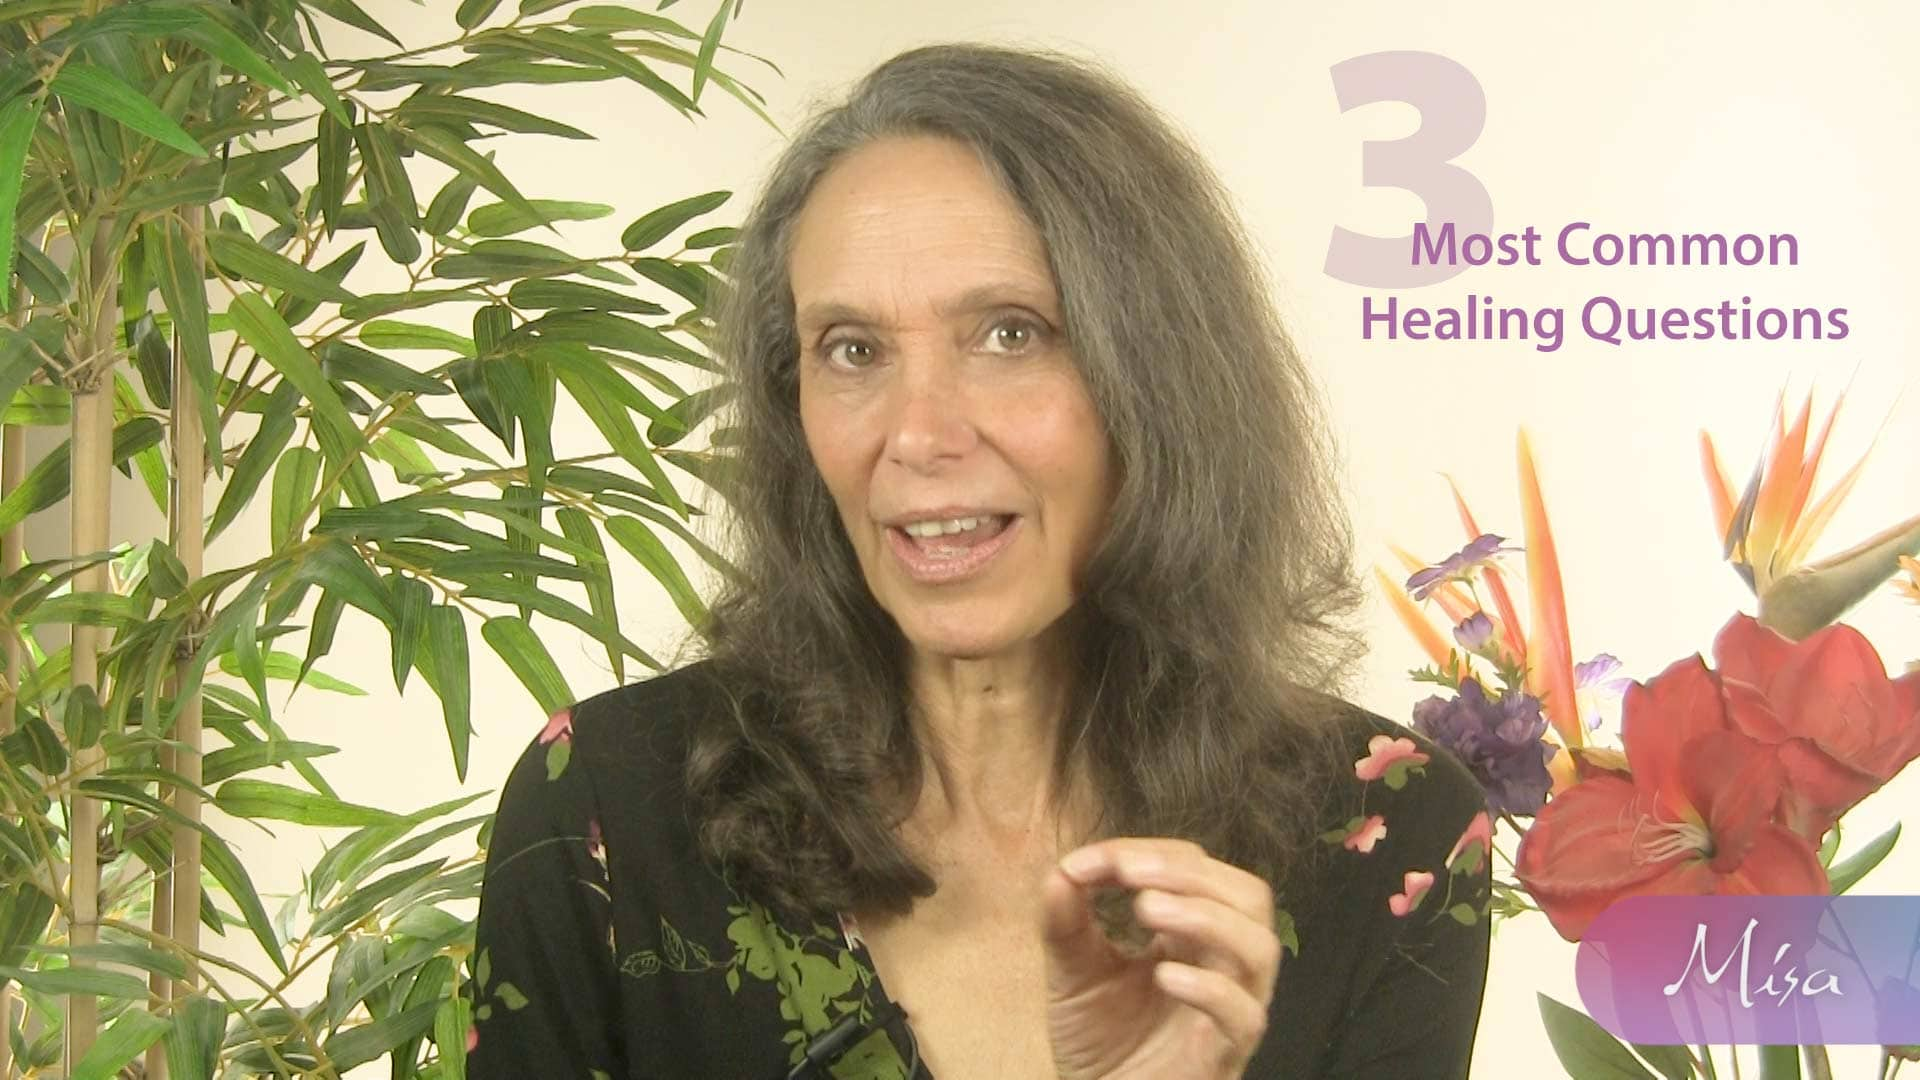 3-Healing-Questions-promo-thumb@1920x1080